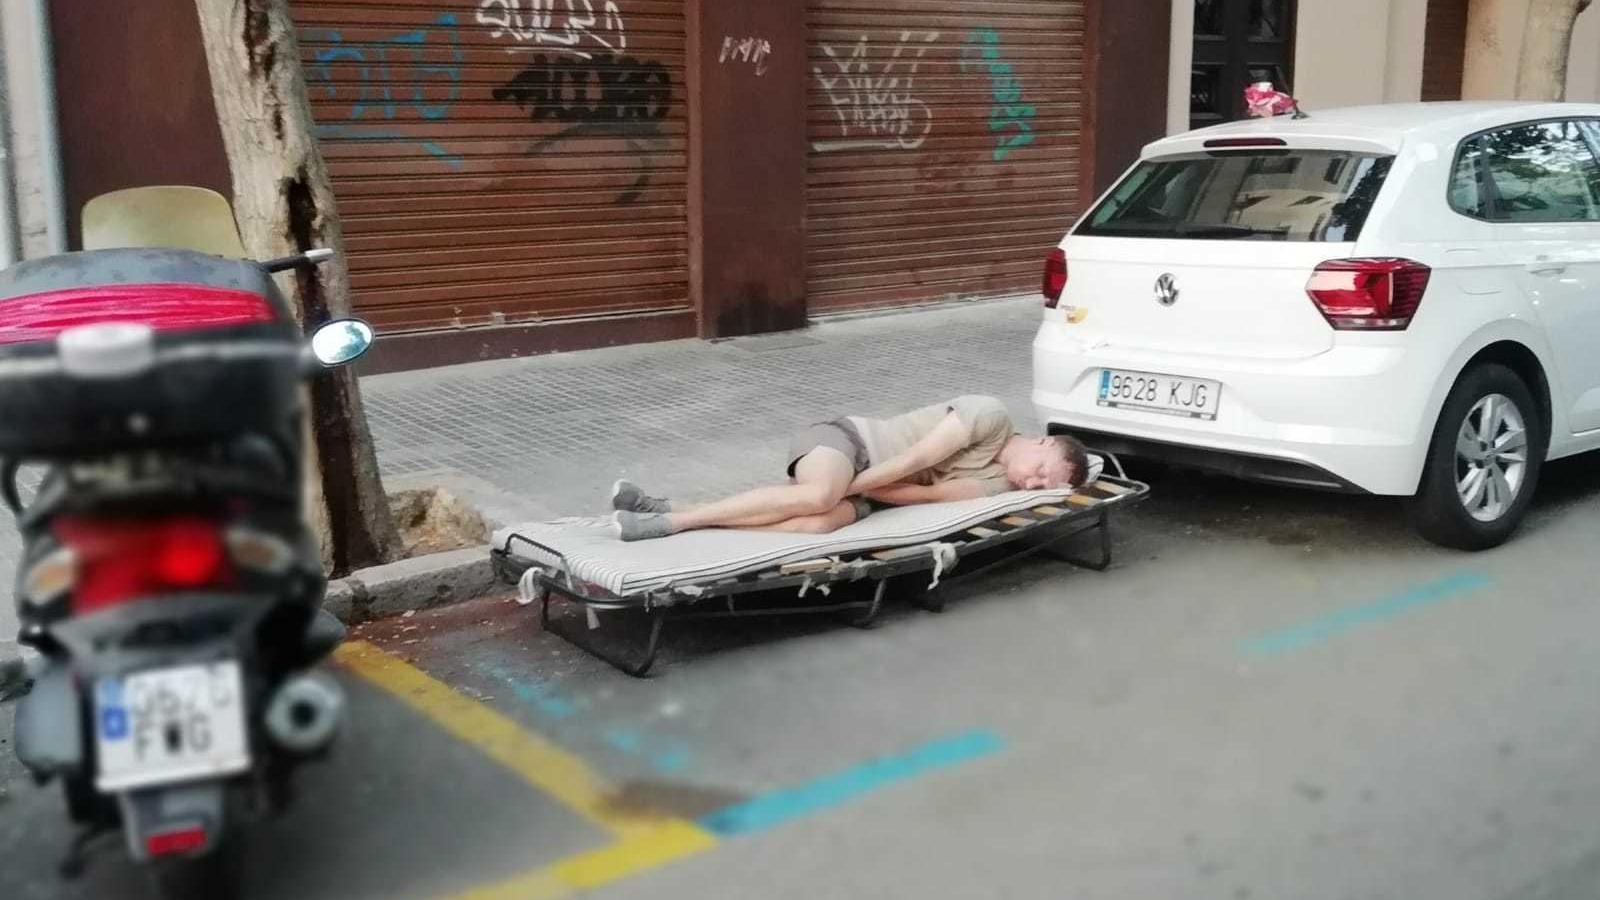 Un home instal·la el seu llit a una zona O.R.A de Santa Catalina